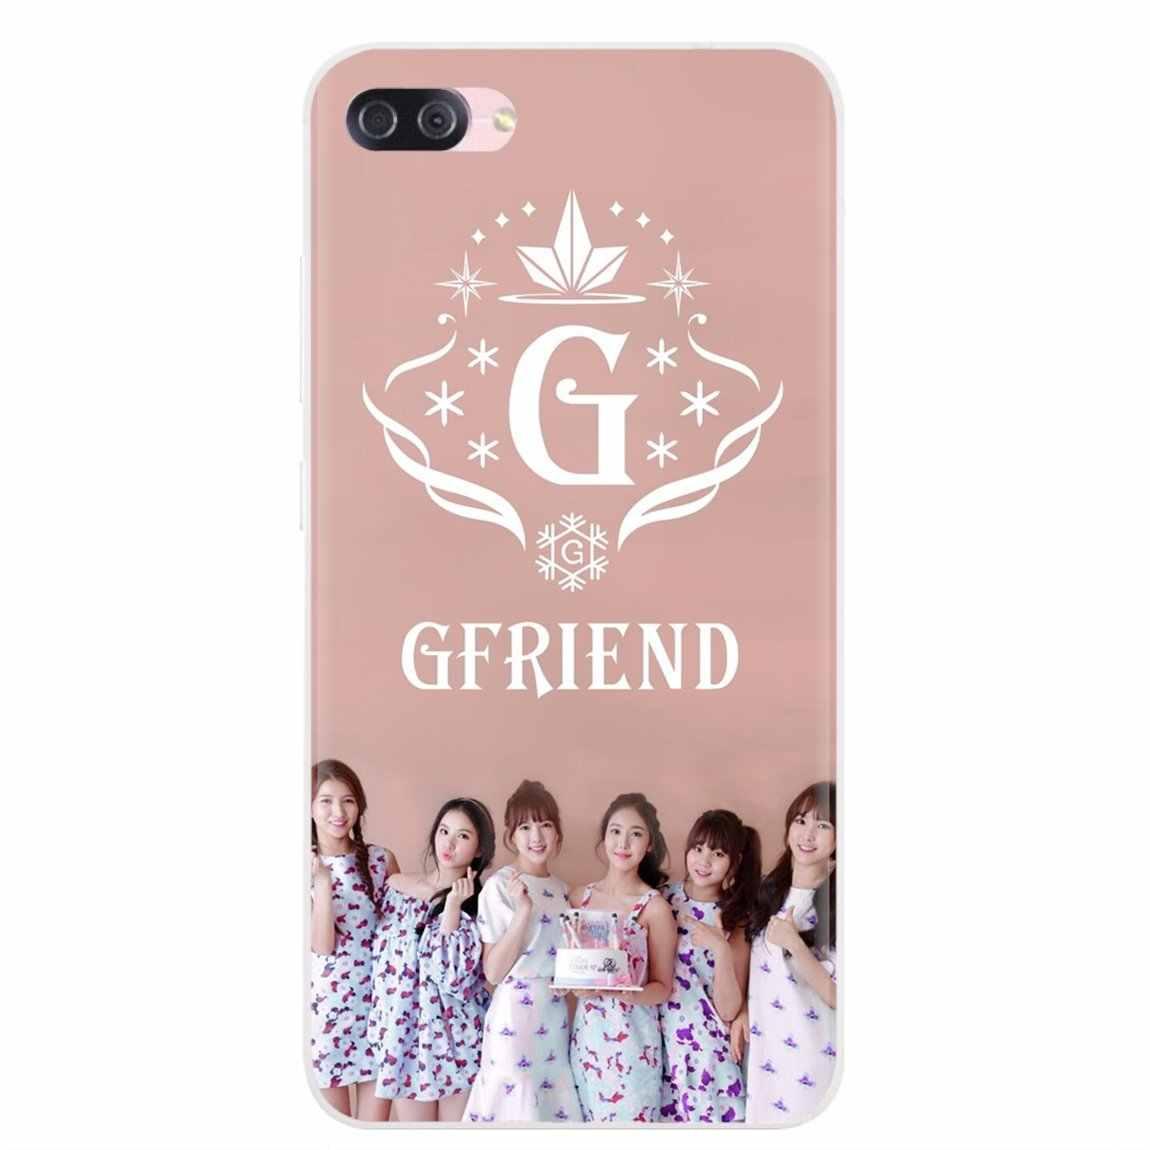 GFriend Kpop אישית סיליקון טלפון מקרה עבור מוטורולה Moto G G2 G3 X4 E4 E5 G5 G5S G6 Z Z2 z3 C לשחק בתוספת